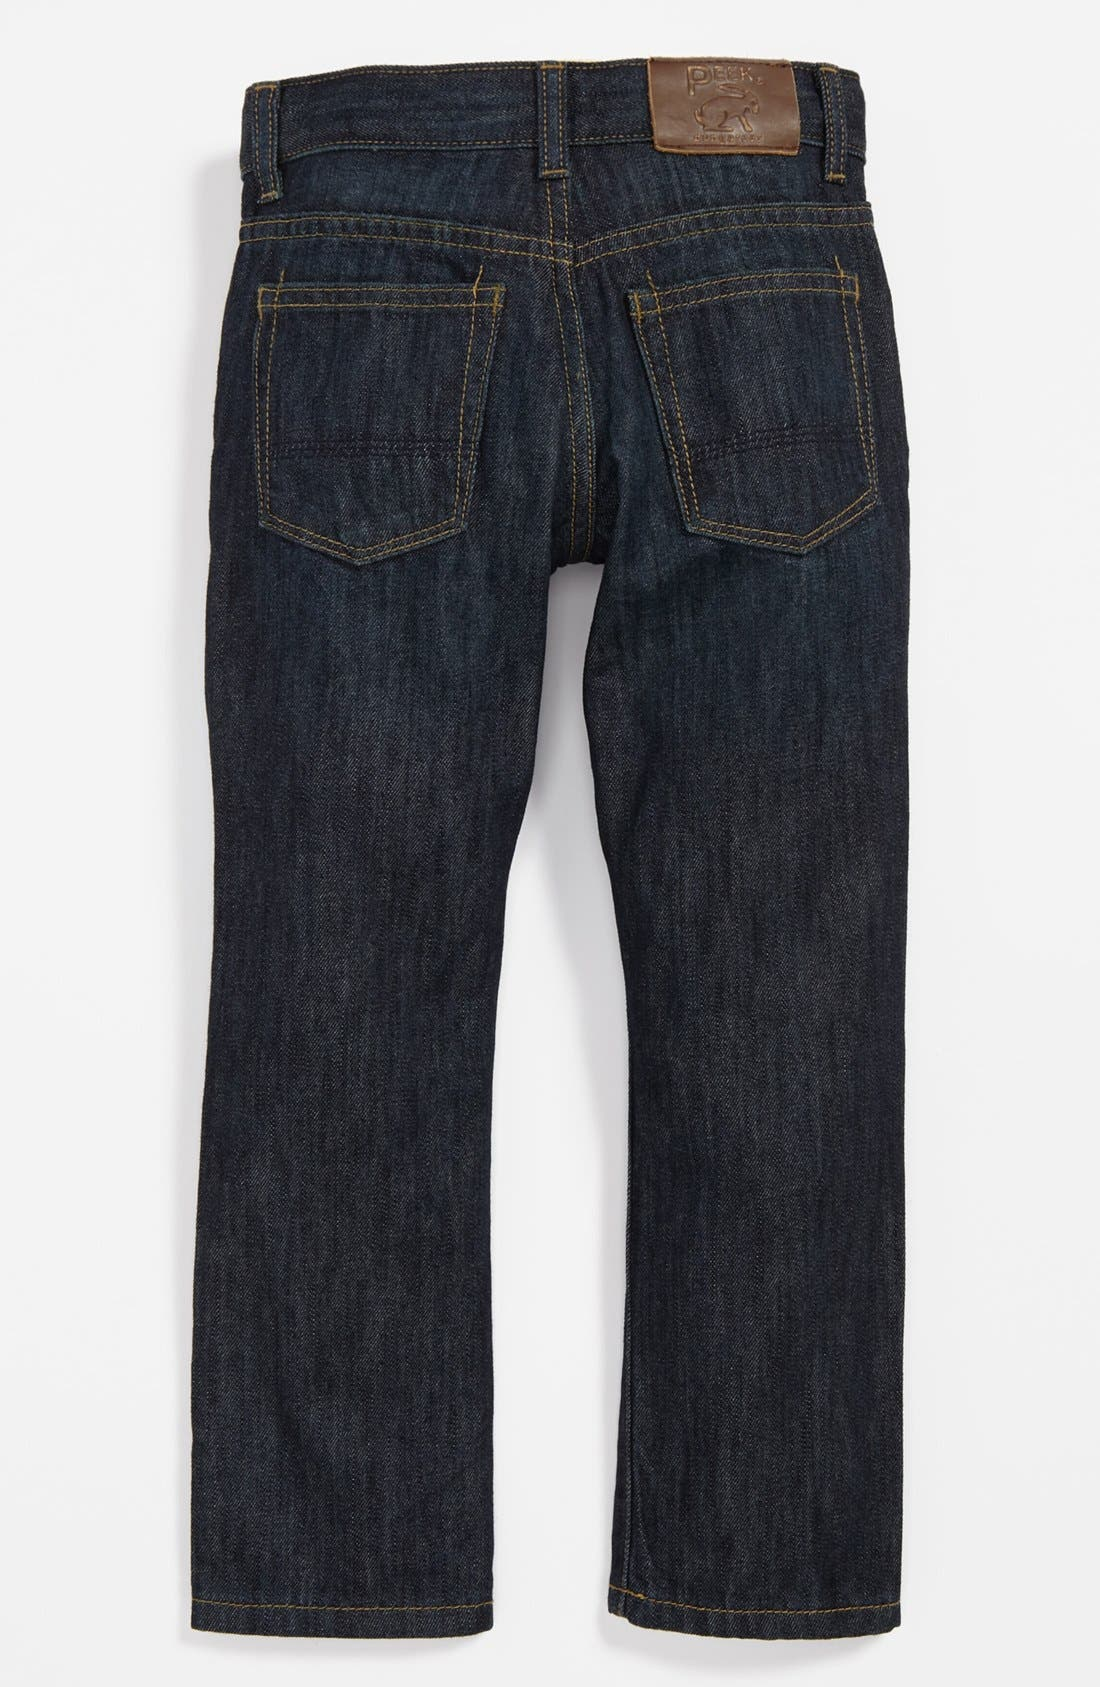 Alternate Image 1 Selected - Peek 'Slouch' Jeans (Toddler Boys, Little Boys & Big Boys)